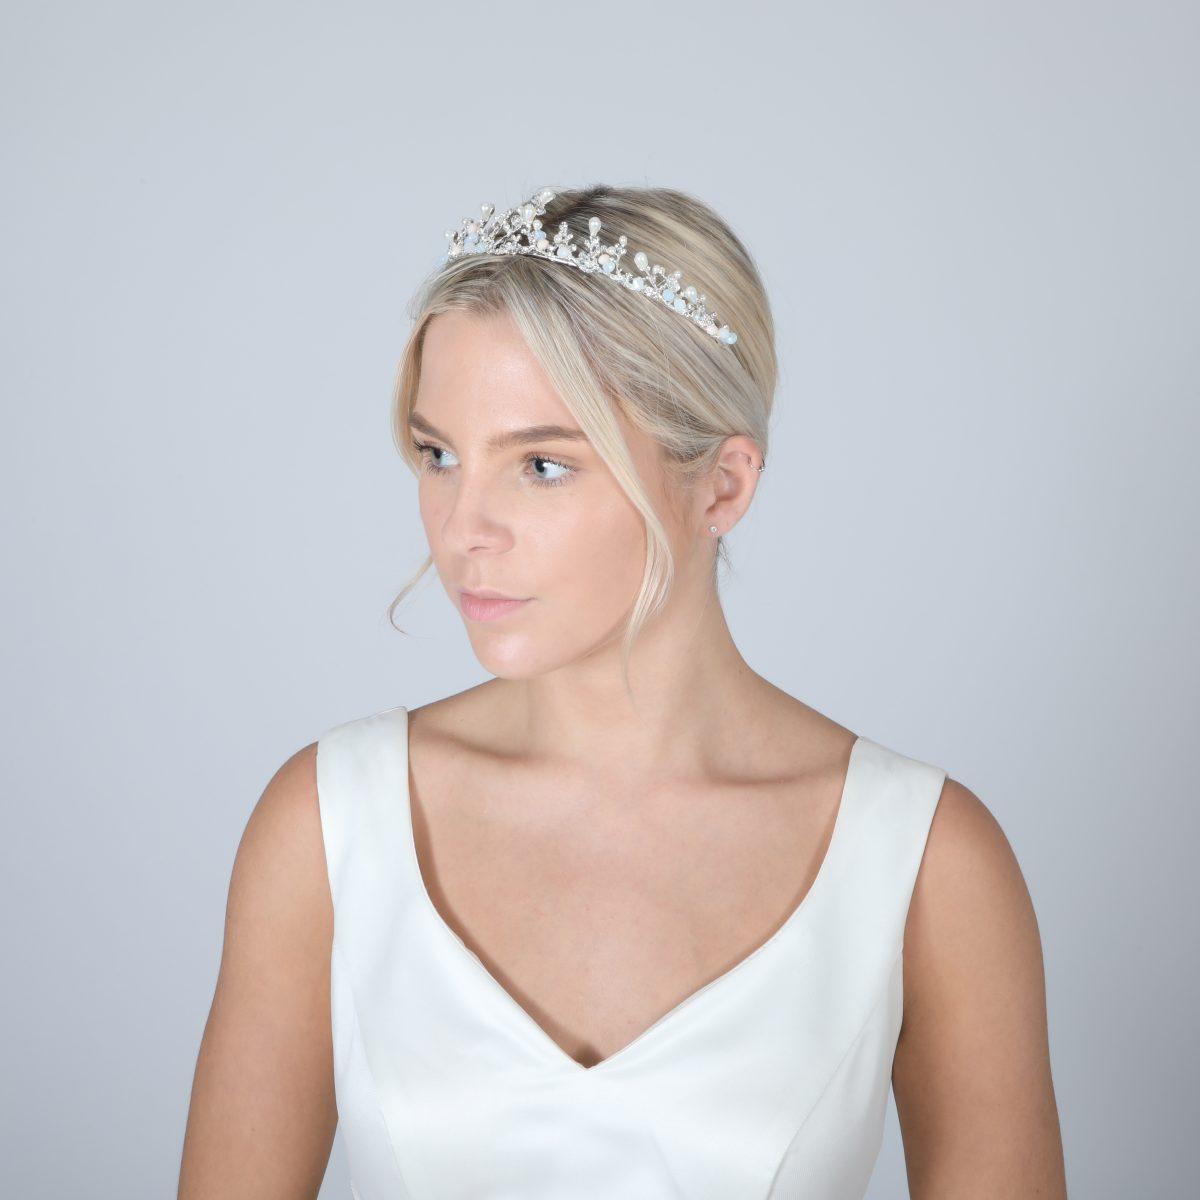 Perfect Bridal Low Crown - PBT5025 - Silver Tone 2